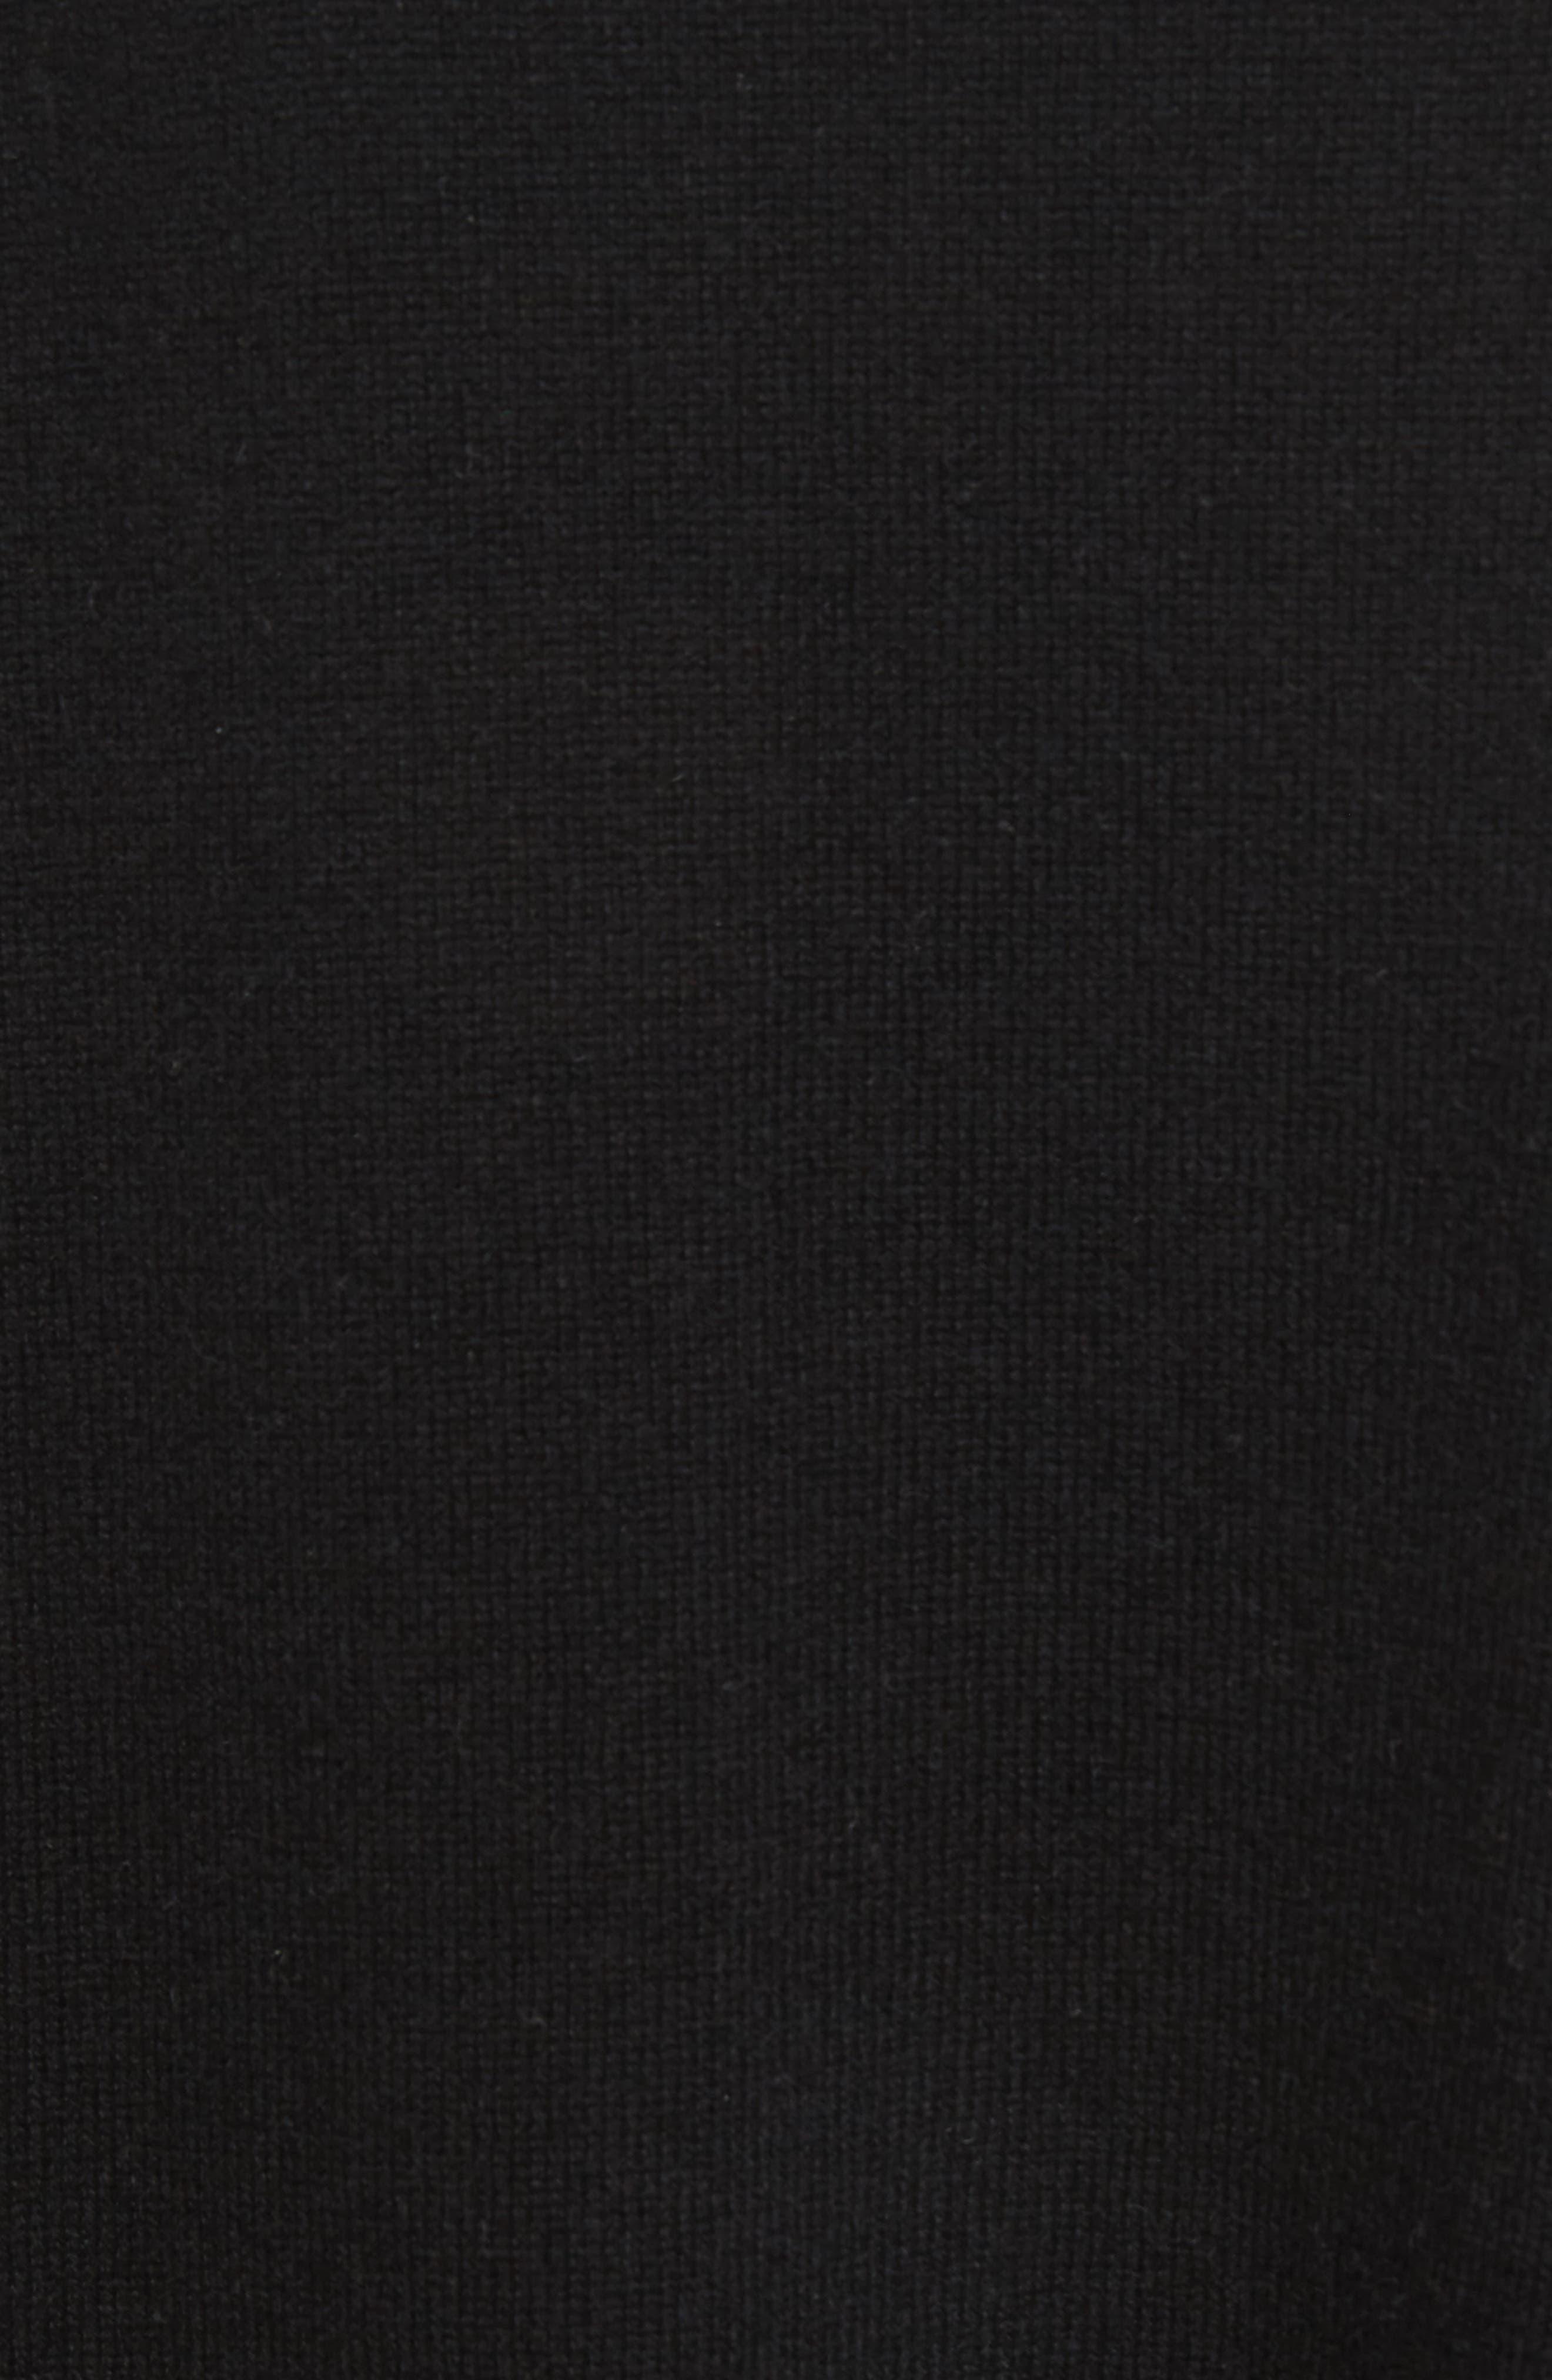 Celia G Wool & Cashmere Sweater,                             Alternate thumbnail 5, color,                             004